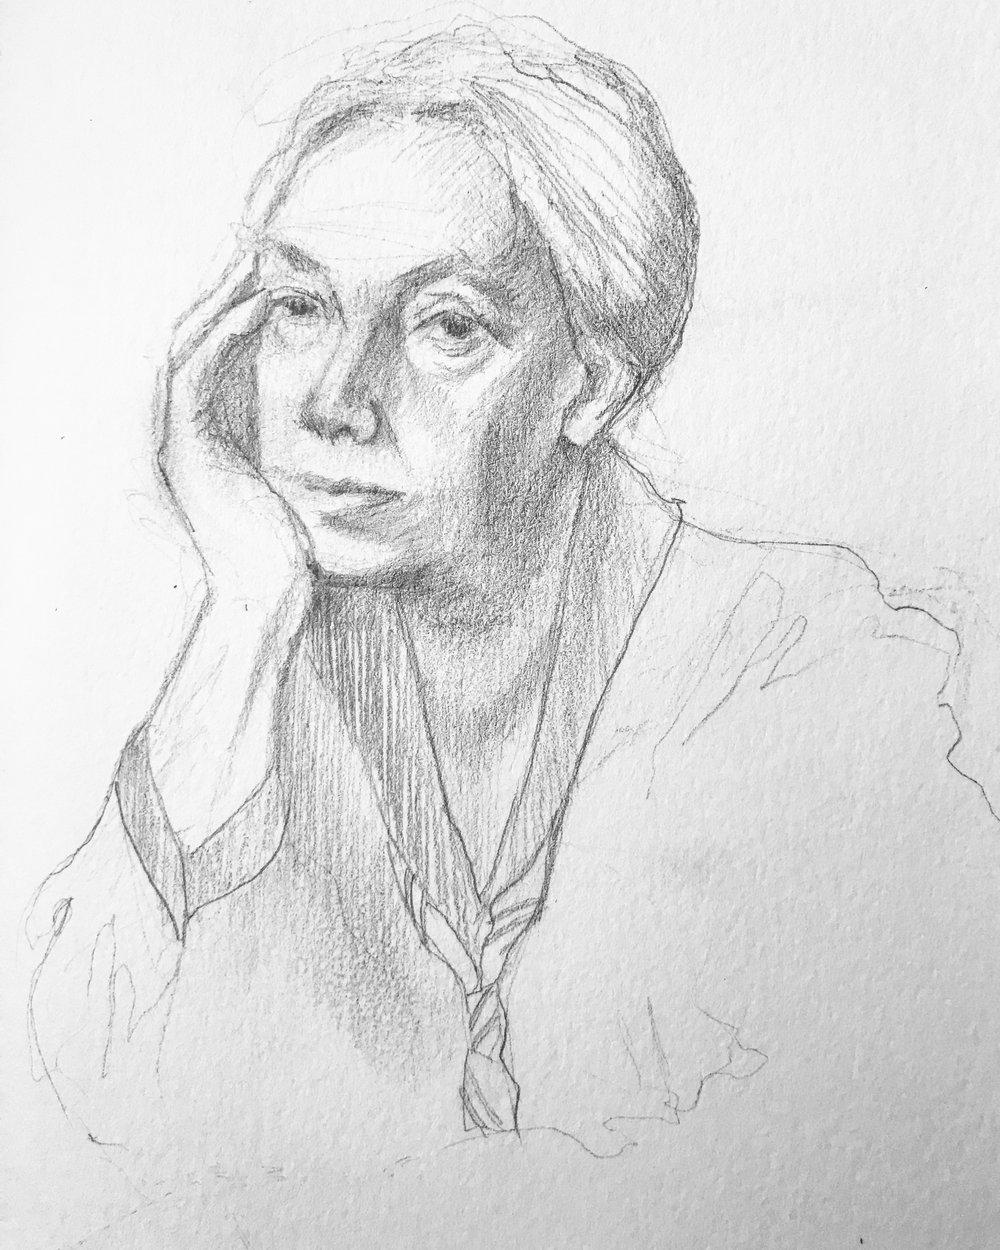 My sensitively rendering pencil sketch of Kathe Kollwitz.